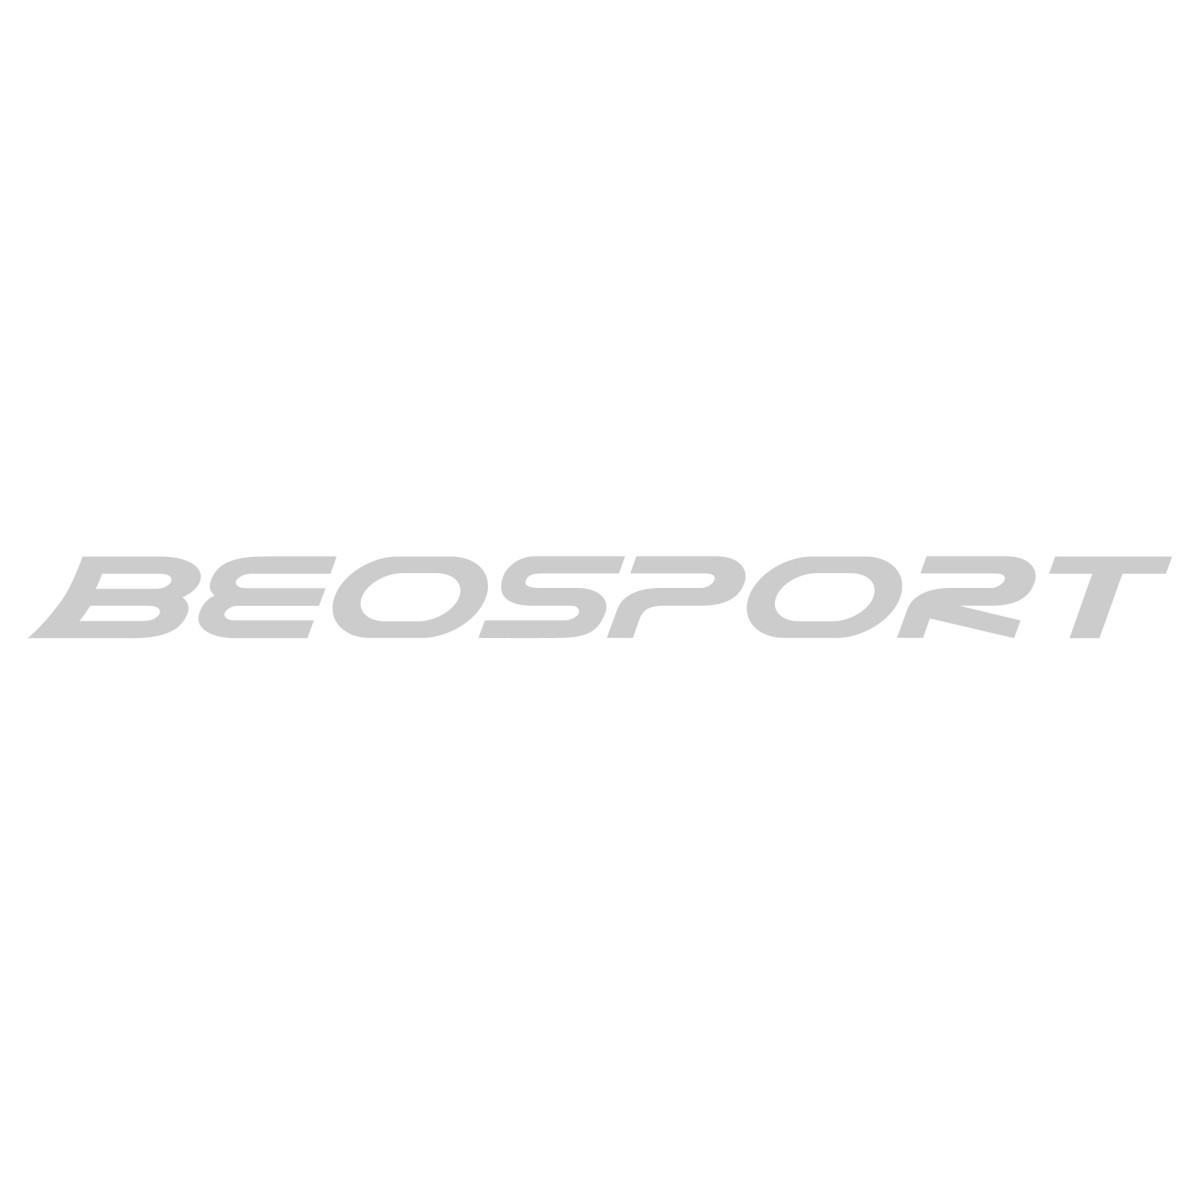 Specialized Air Sport Switch Hitter II pumpa